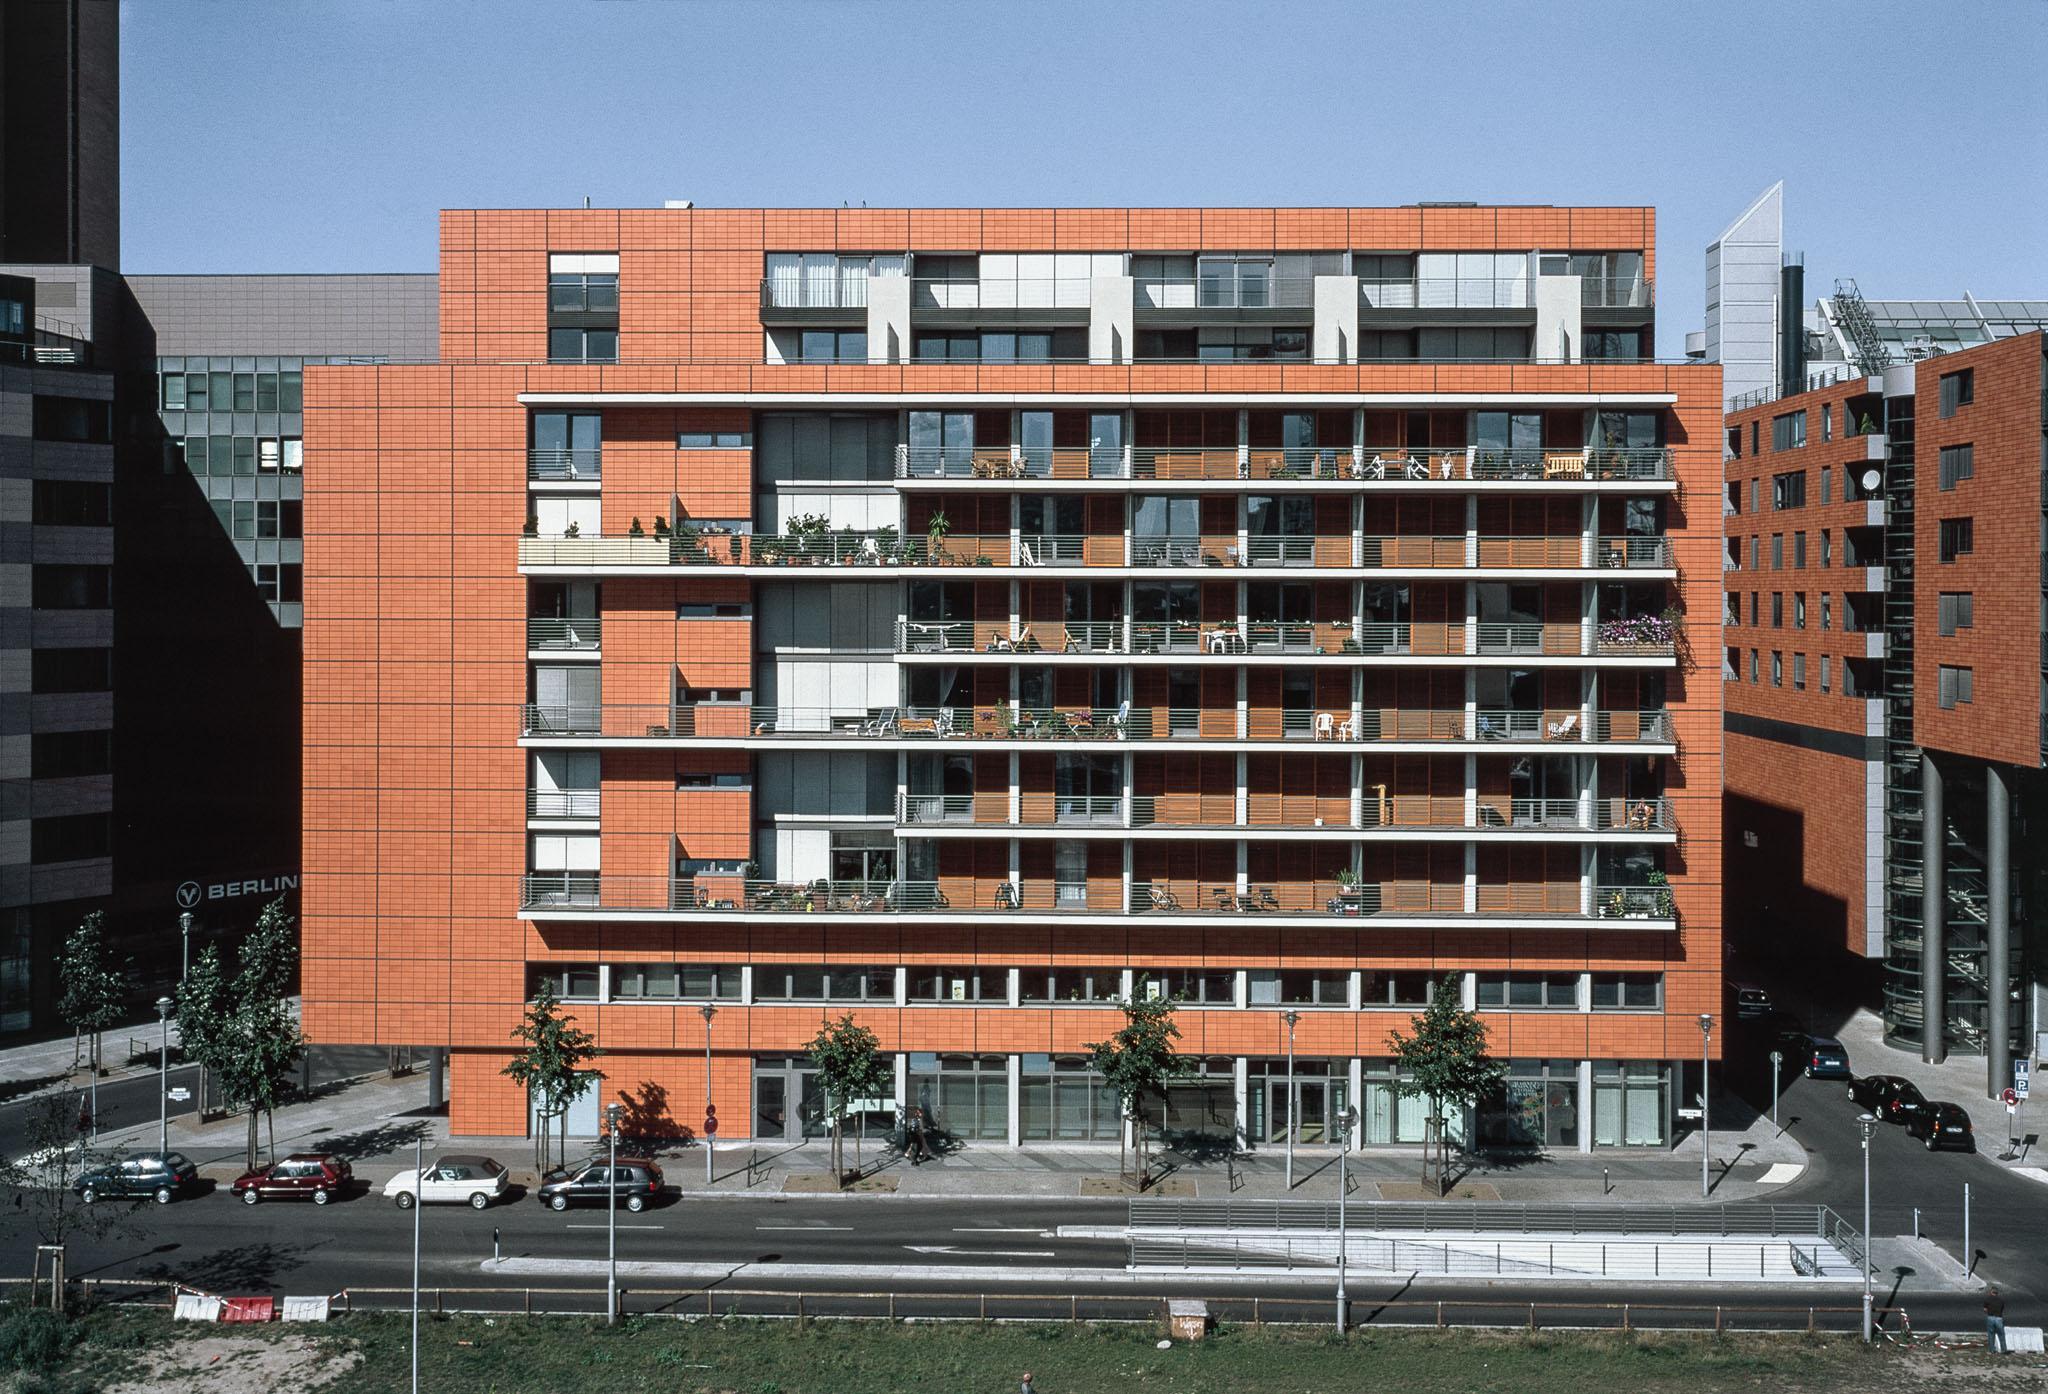 B9 Potsdamer Platz 5